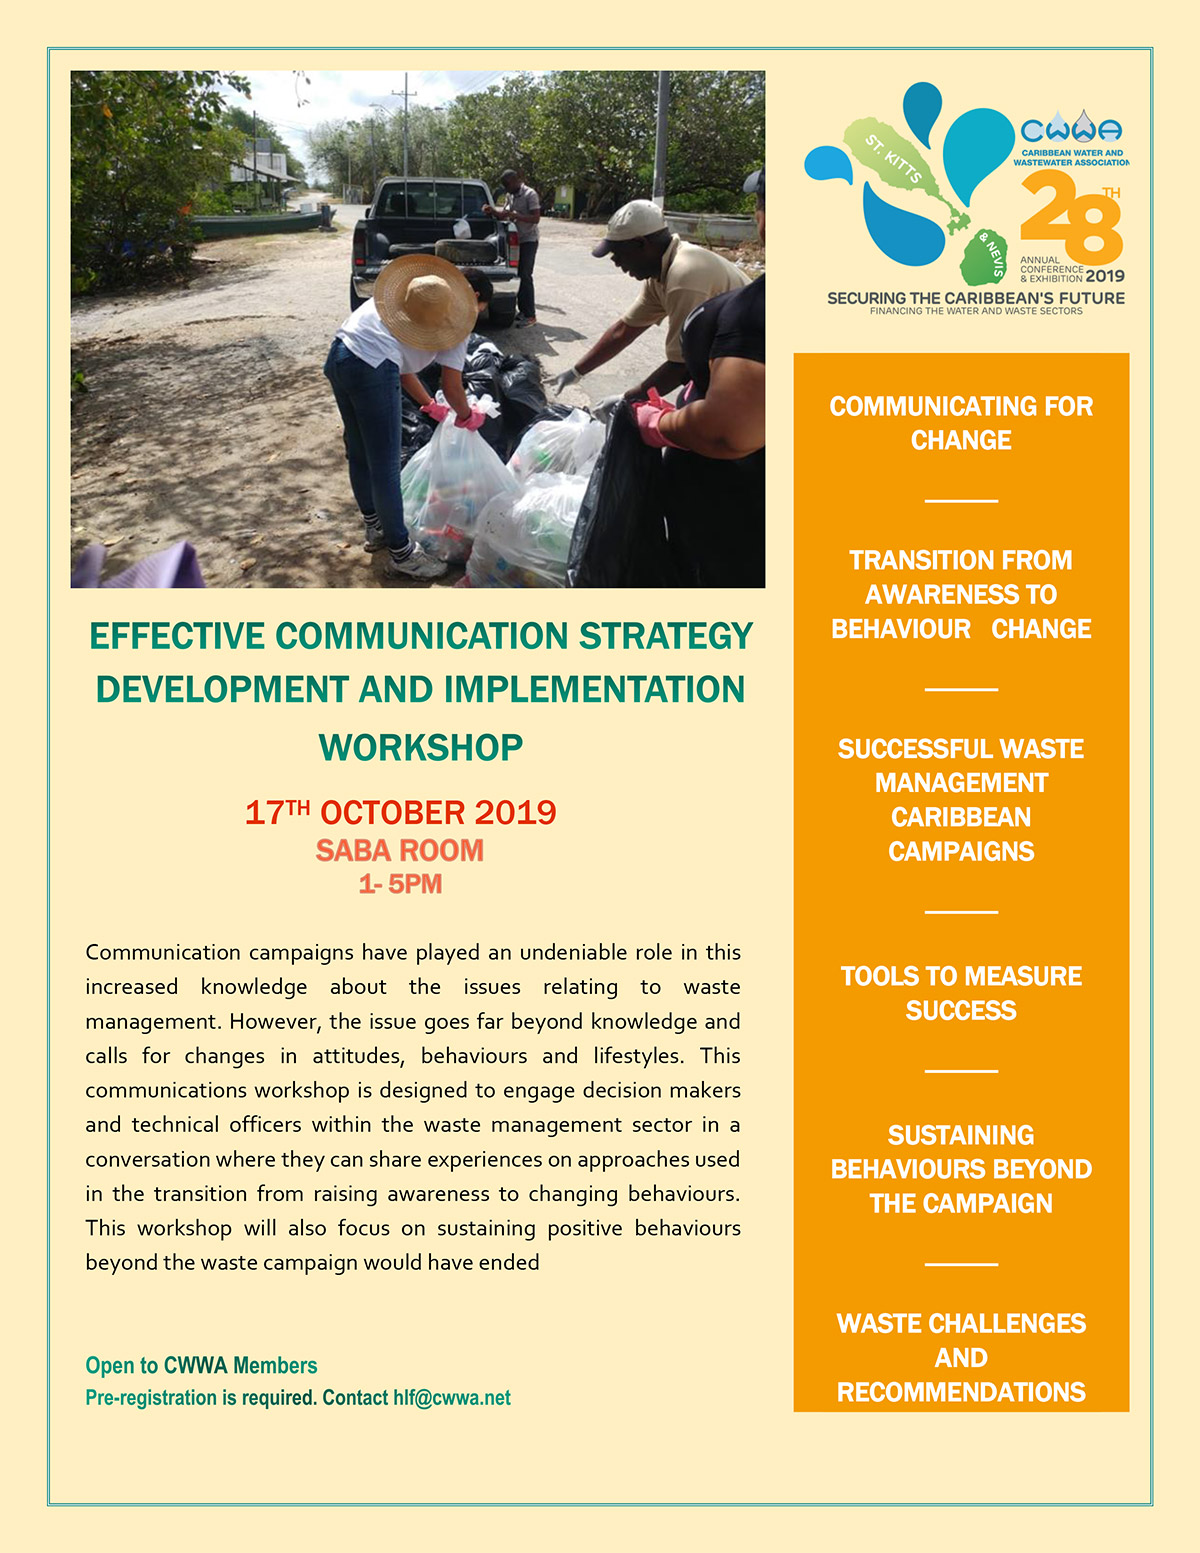 Effective Communication Strategy Development and Implementation Workshop